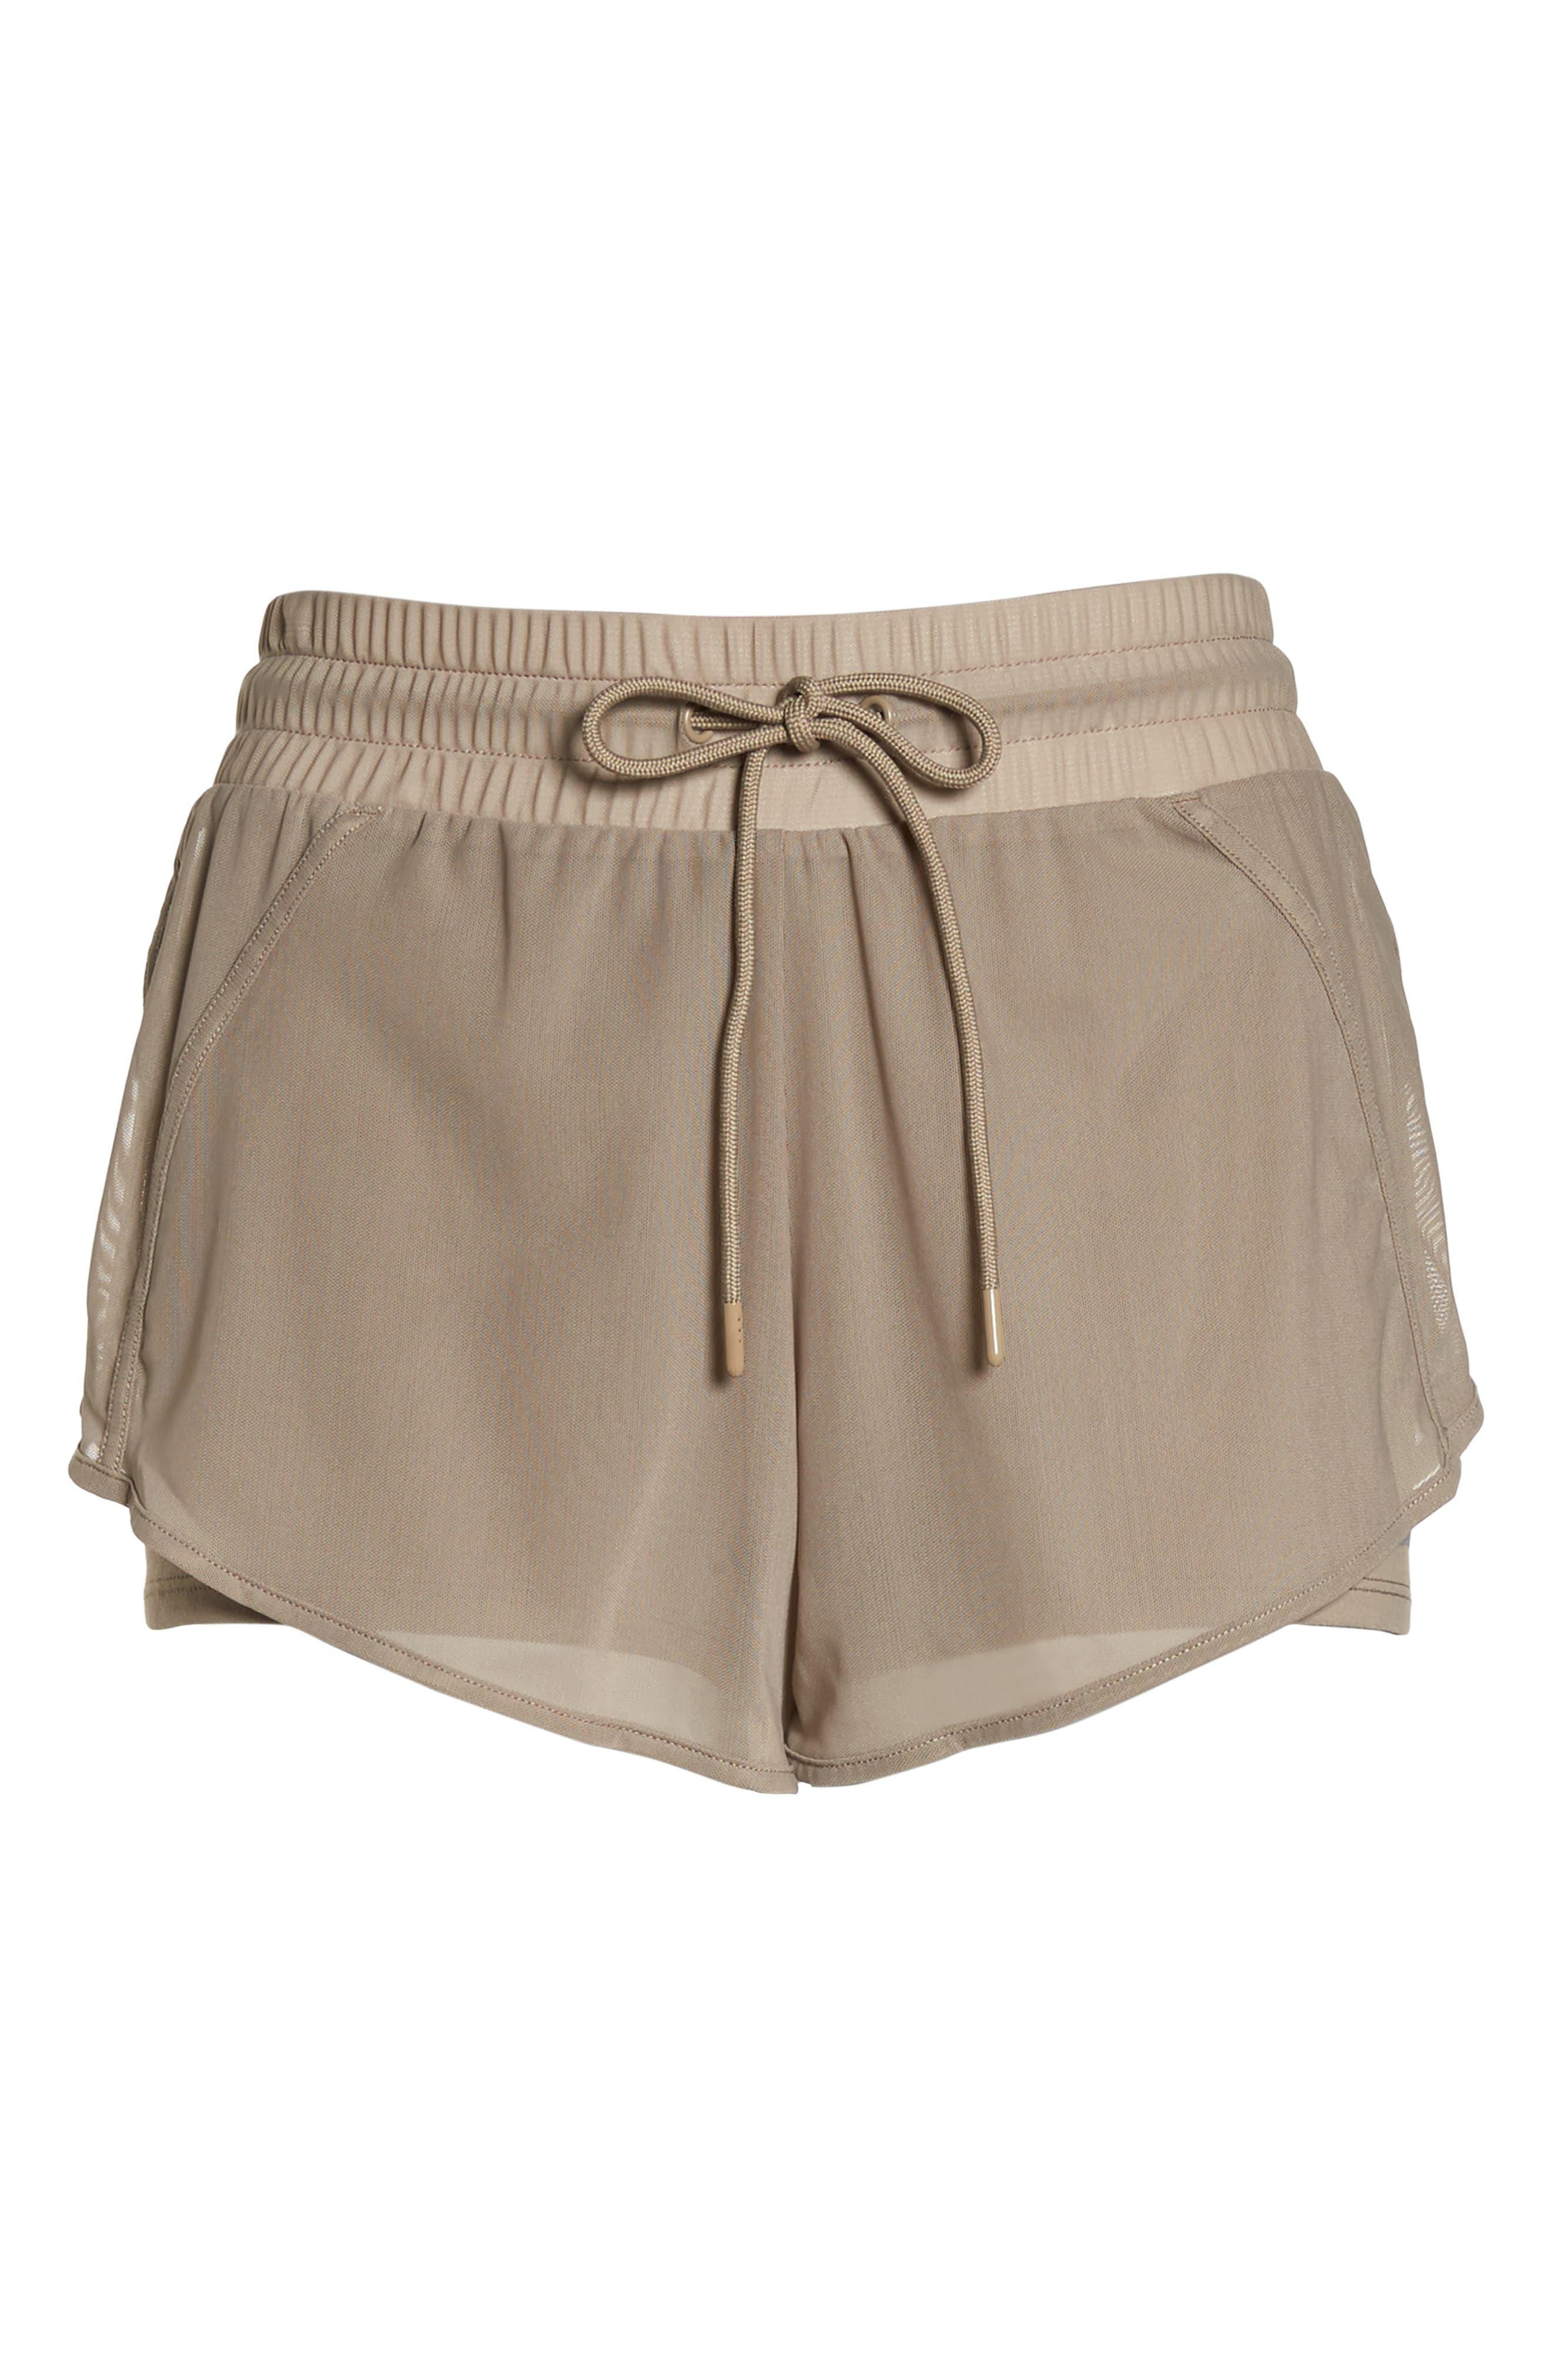 Ambience Shorts,                             Alternate thumbnail 7, color,                             Gravel